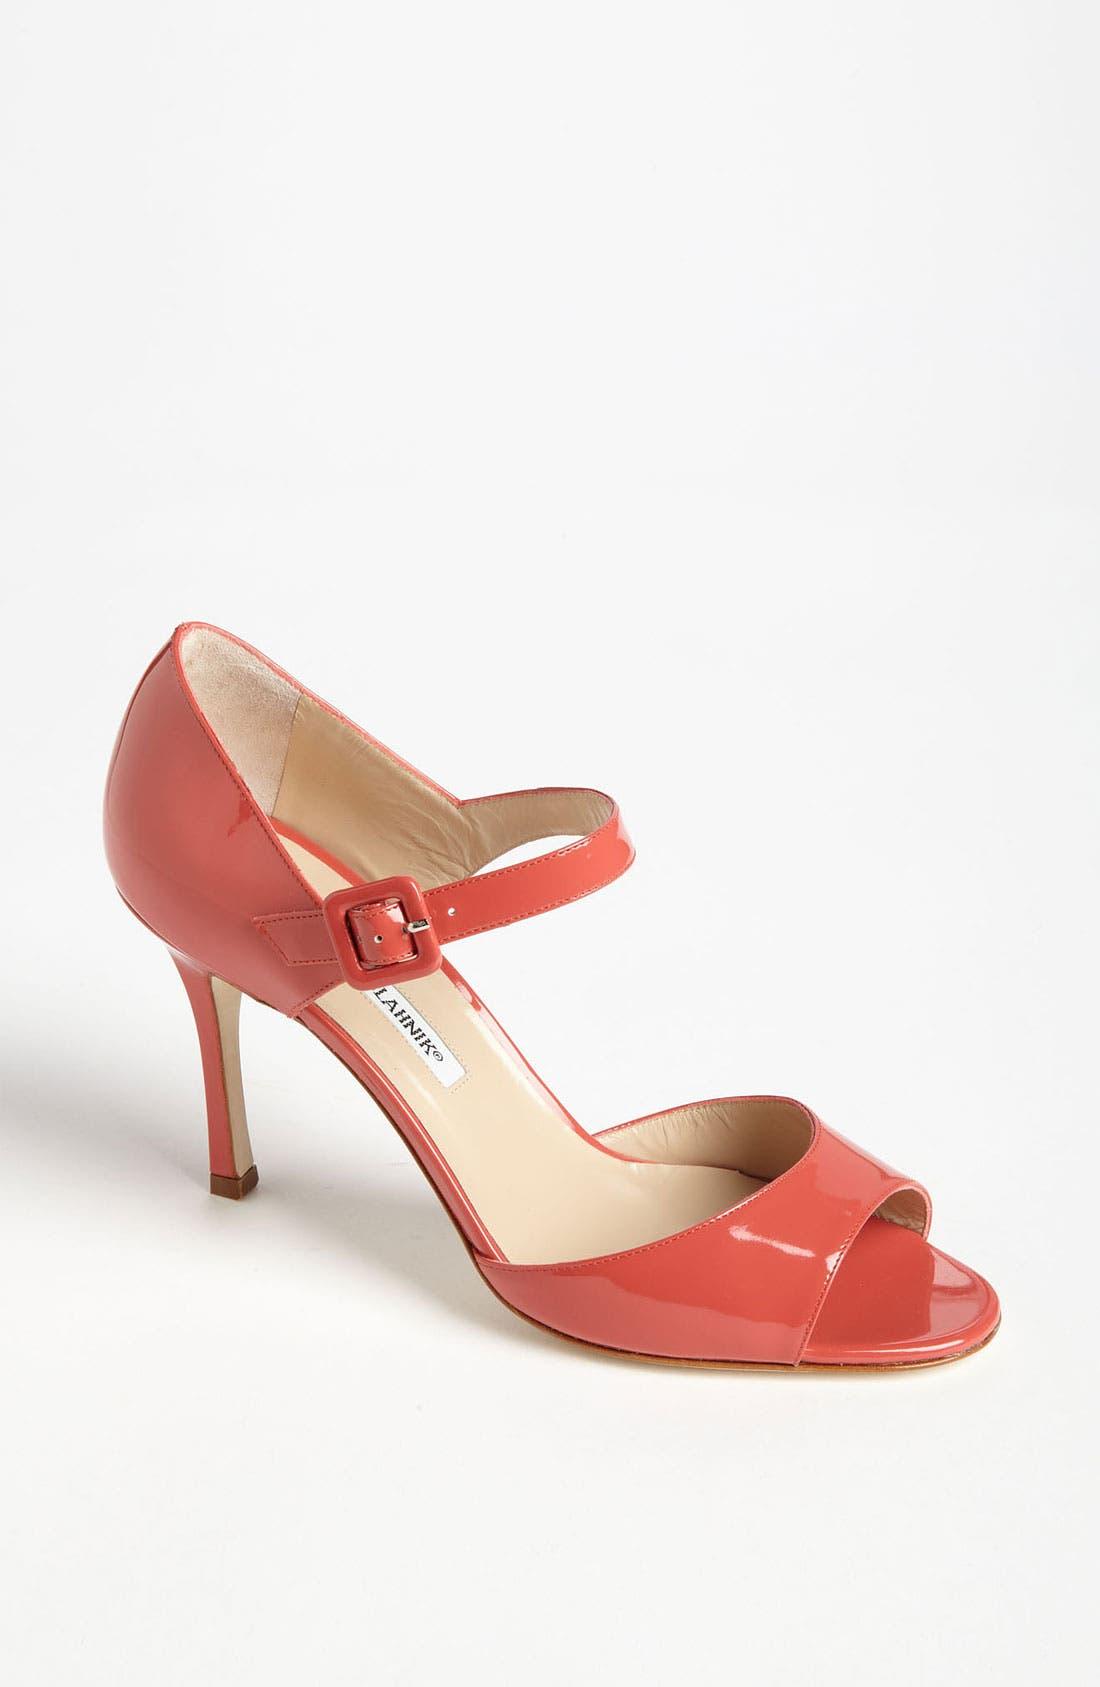 Alternate Image 1 Selected - Manolo Blahnik 'Caldo' Sandal